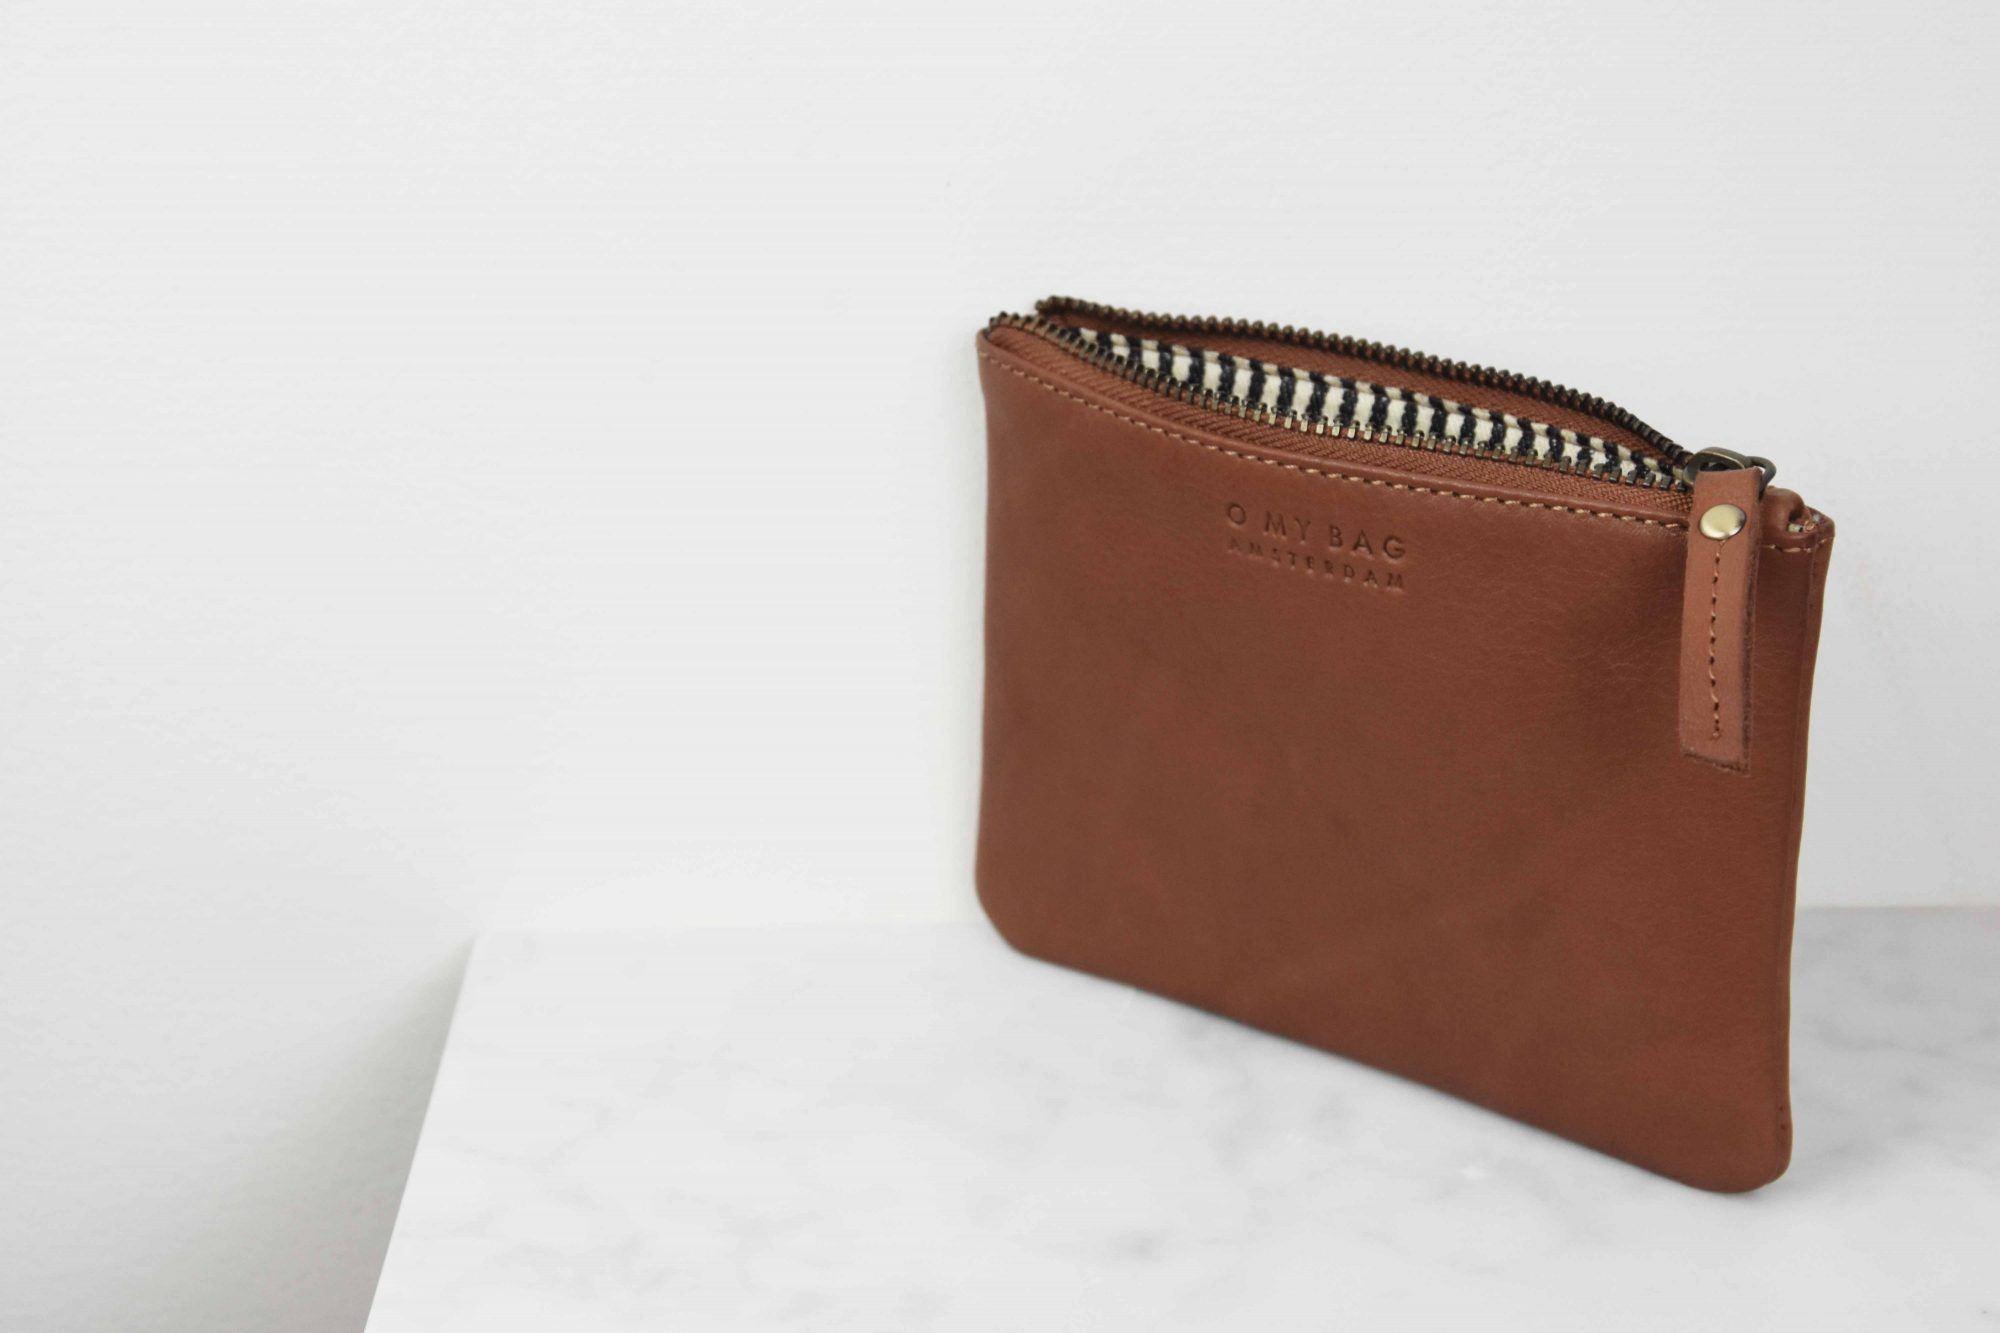 O My Bag ekoläder. Plånbok Scottie nano